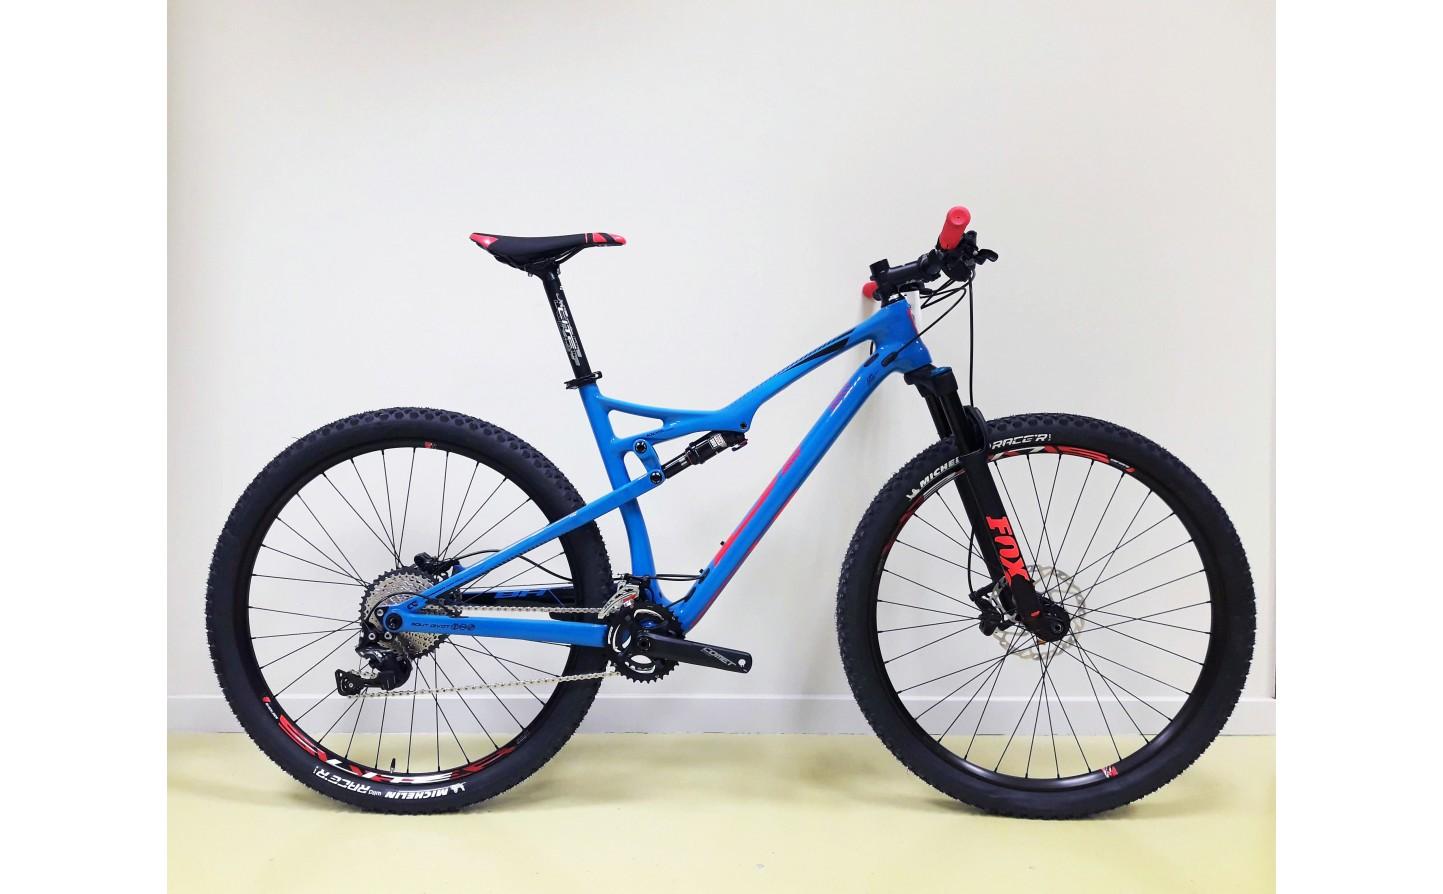 diseño distintivo 100% de alta calidad envío directo Bicicleta BH Lynx Race Carbon Fox|DX698| 2018 - Fabregues ...